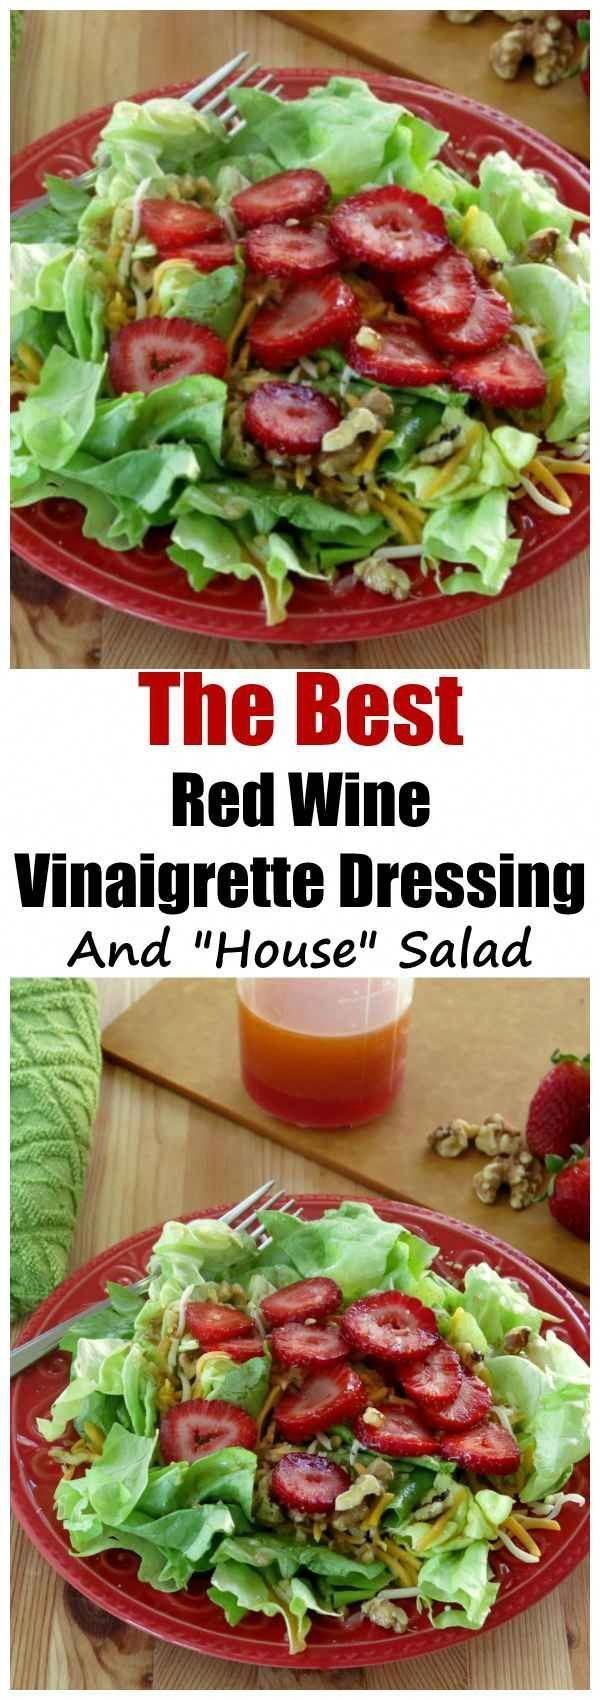 Affordable Wine Clubs Winegiftbags Code 2711272332 Goodwine Red Wine Vinaigrette Salad Dressing Recipe Salad Dressing Recipes Vinaigrette Recipes Healthy [ 1700 x 600 Pixel ]